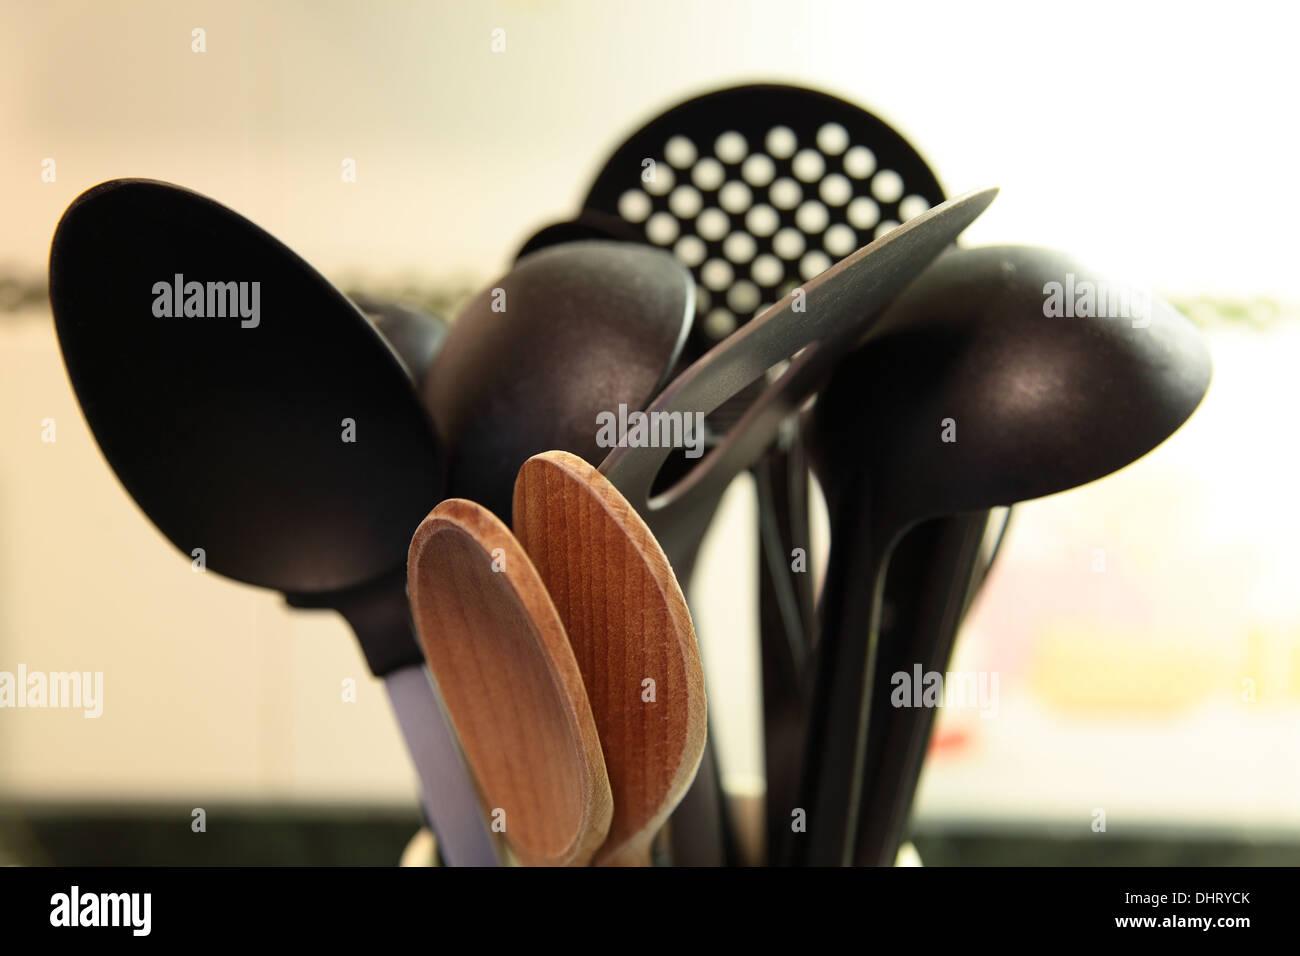 Selection of kitchen utensils - Stock Image